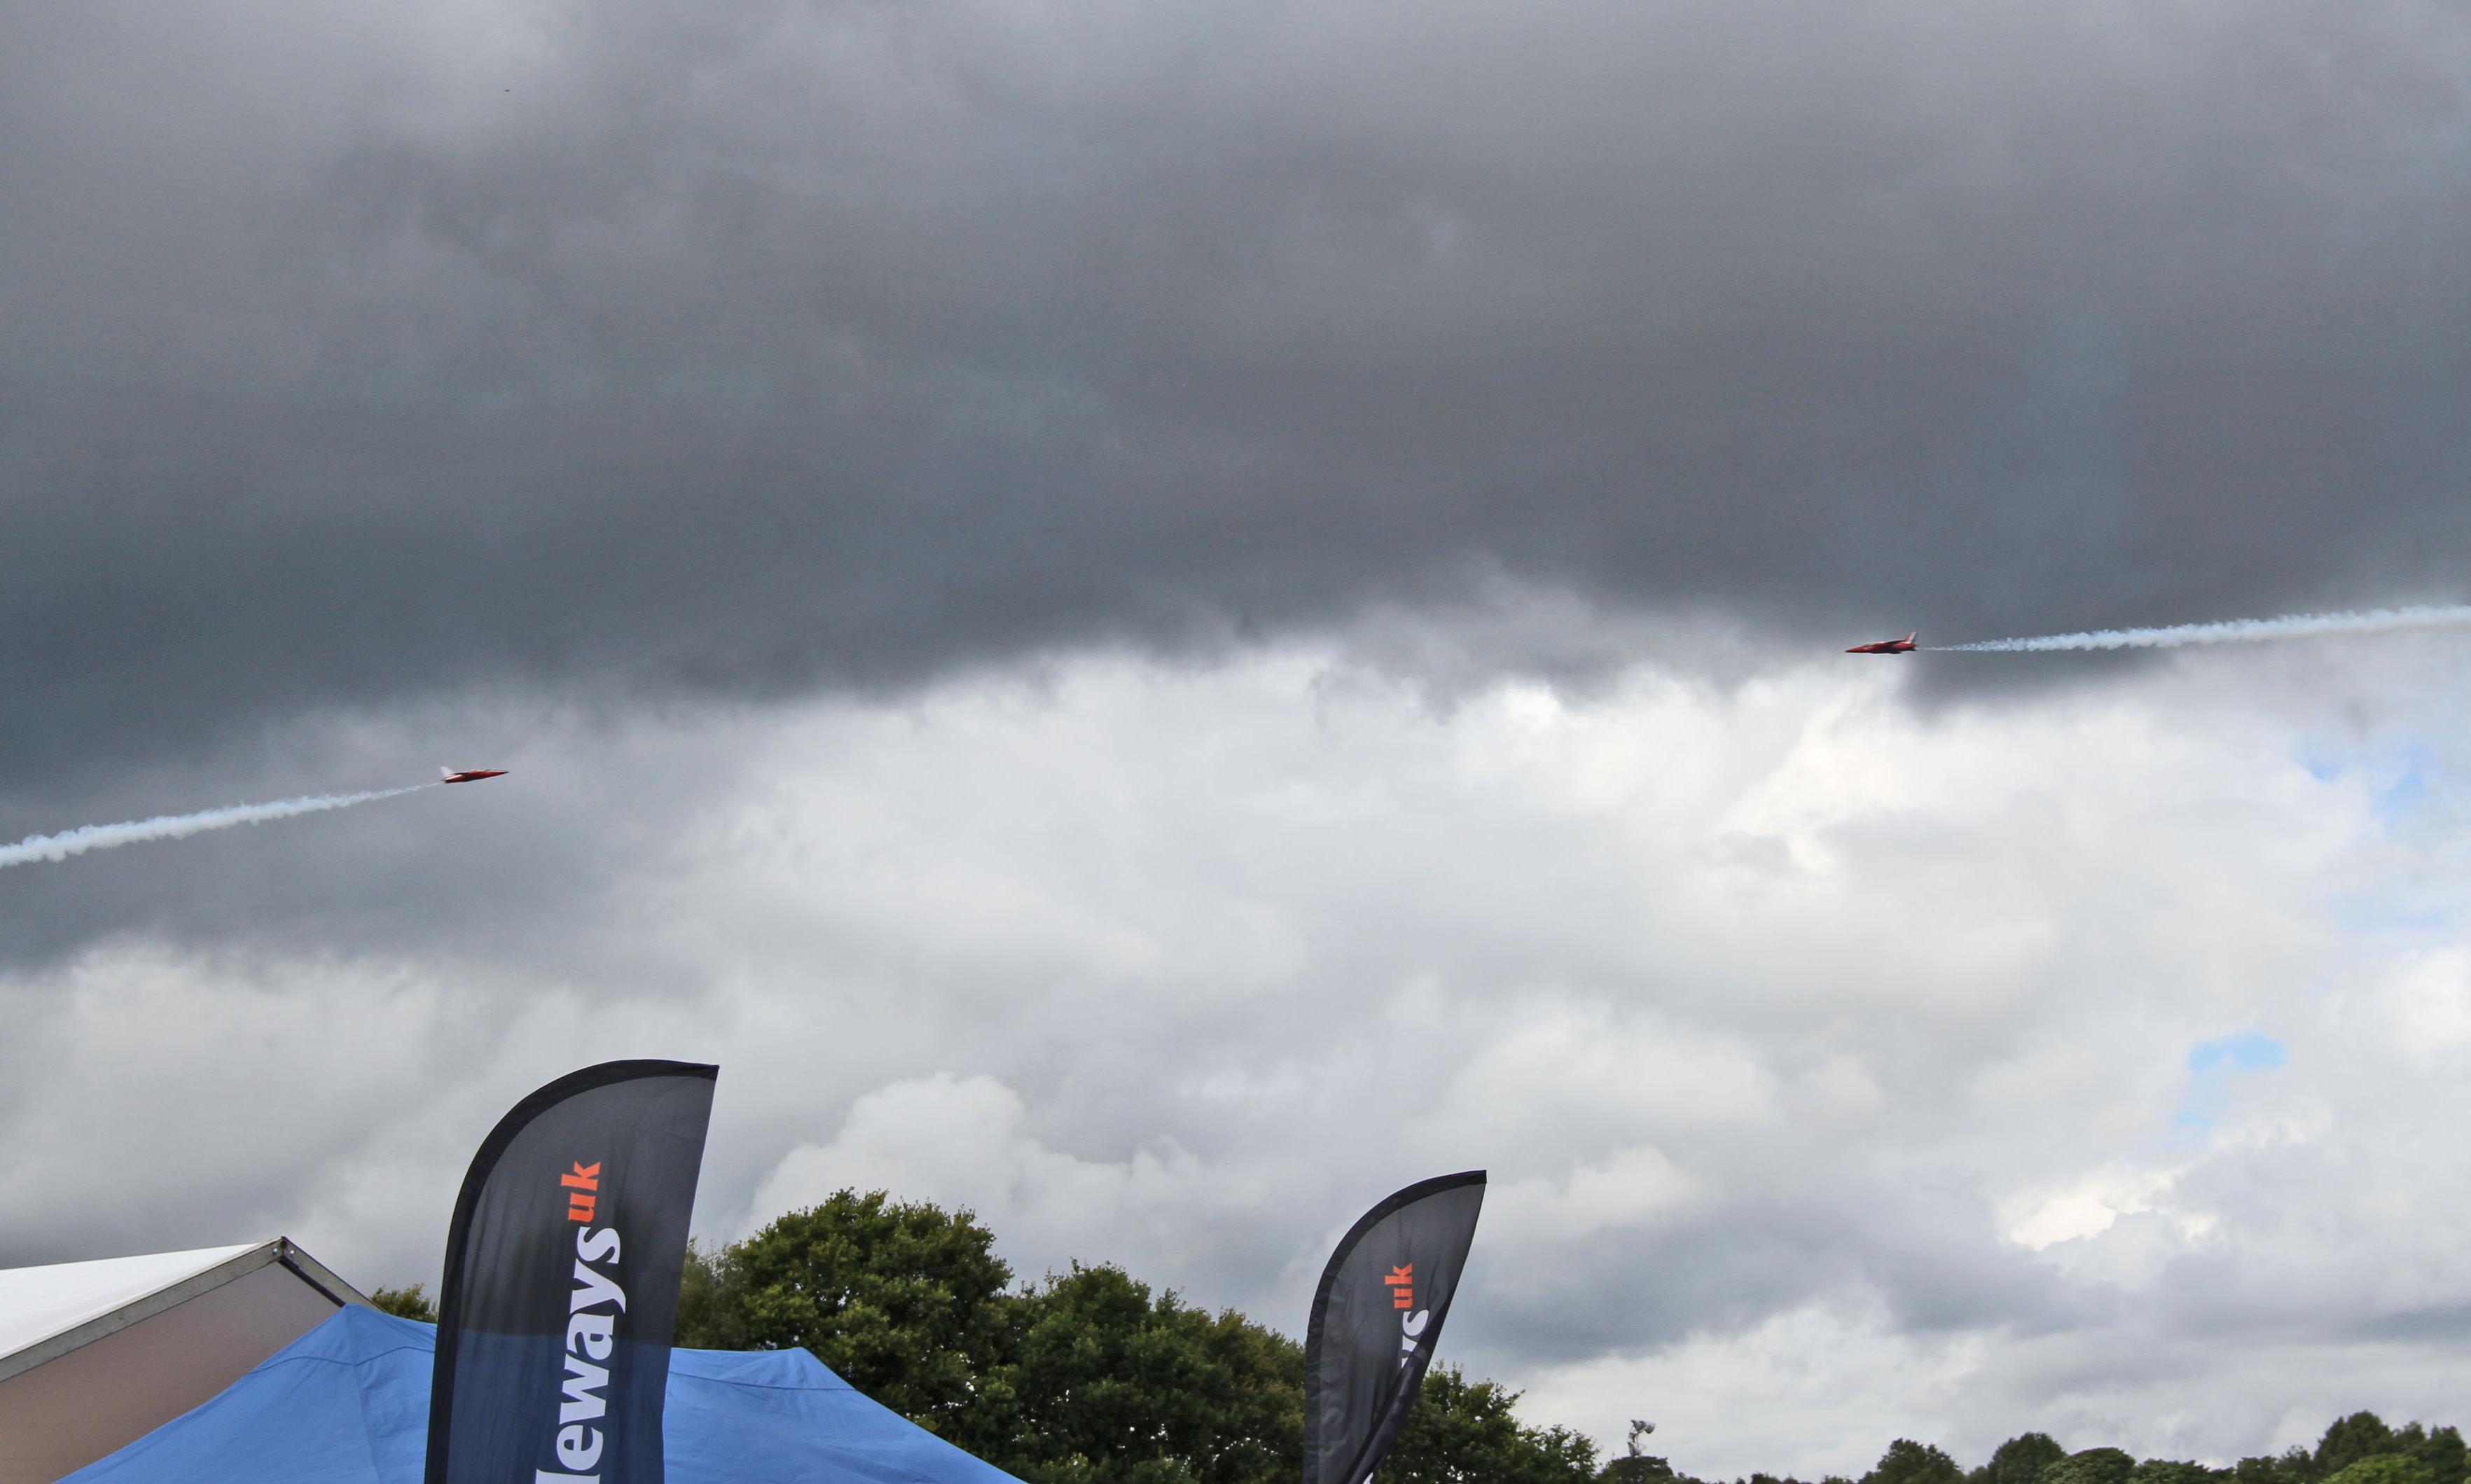 Pilot killed in plane crash at Chris Evans' car festival